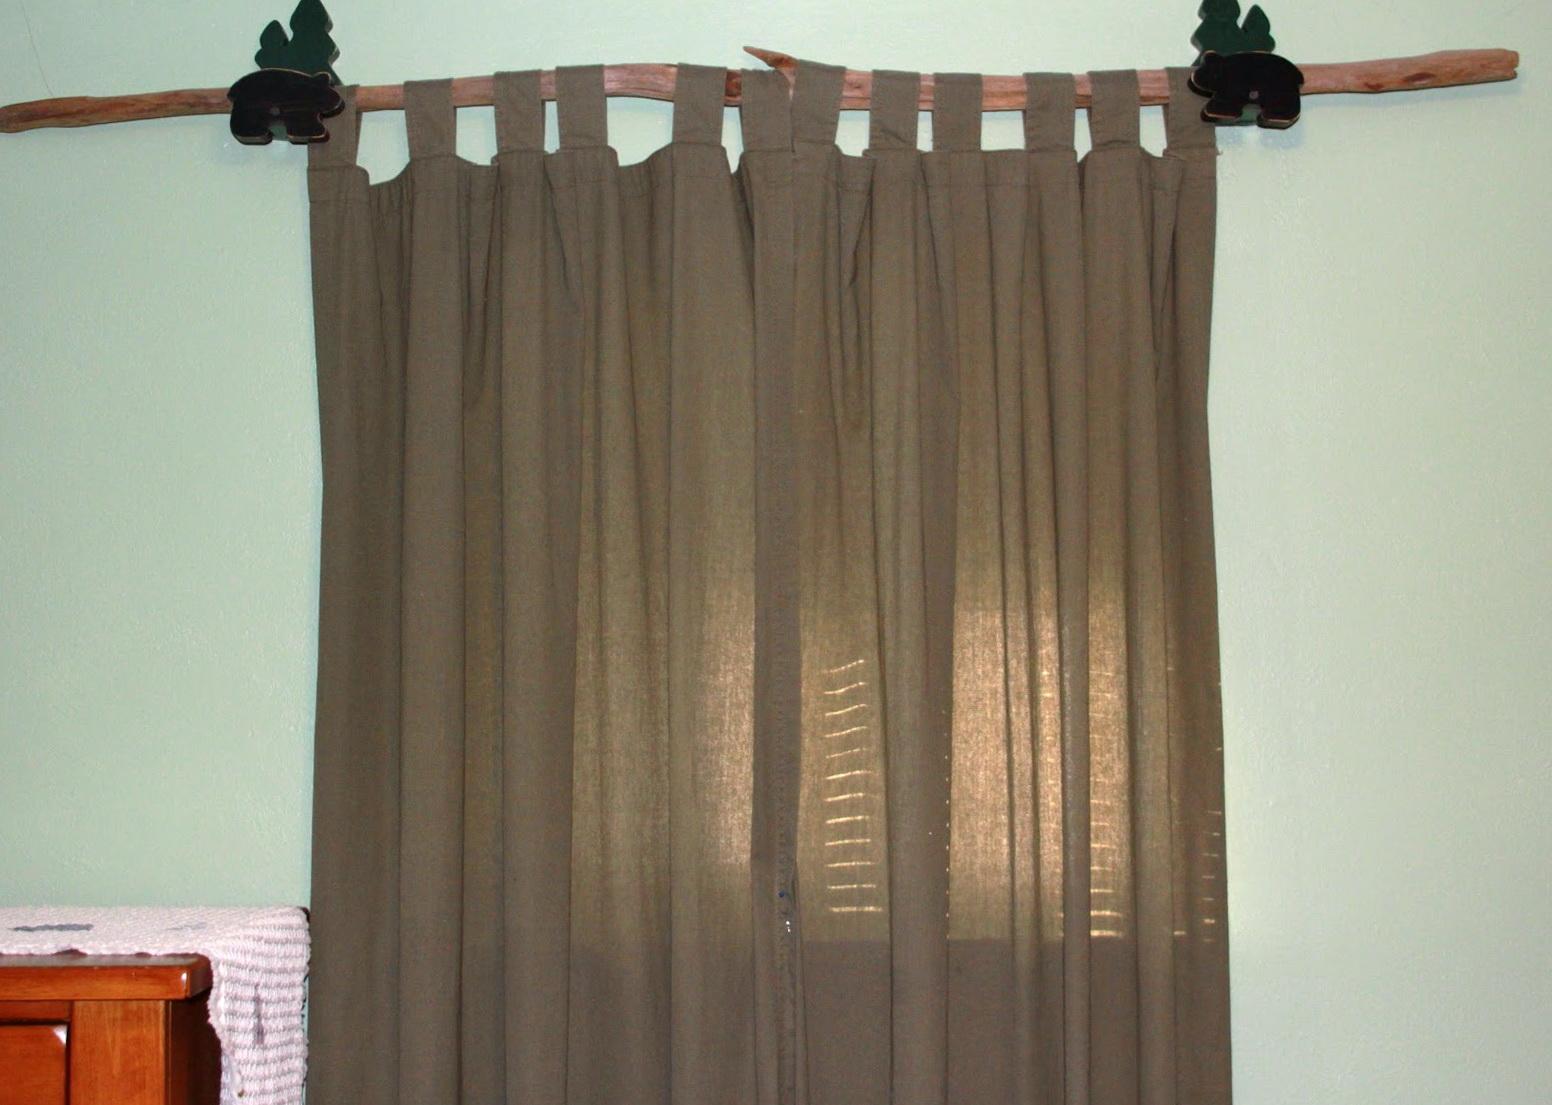 Industrial Curtain Rod Ideas  Home Design Ideas